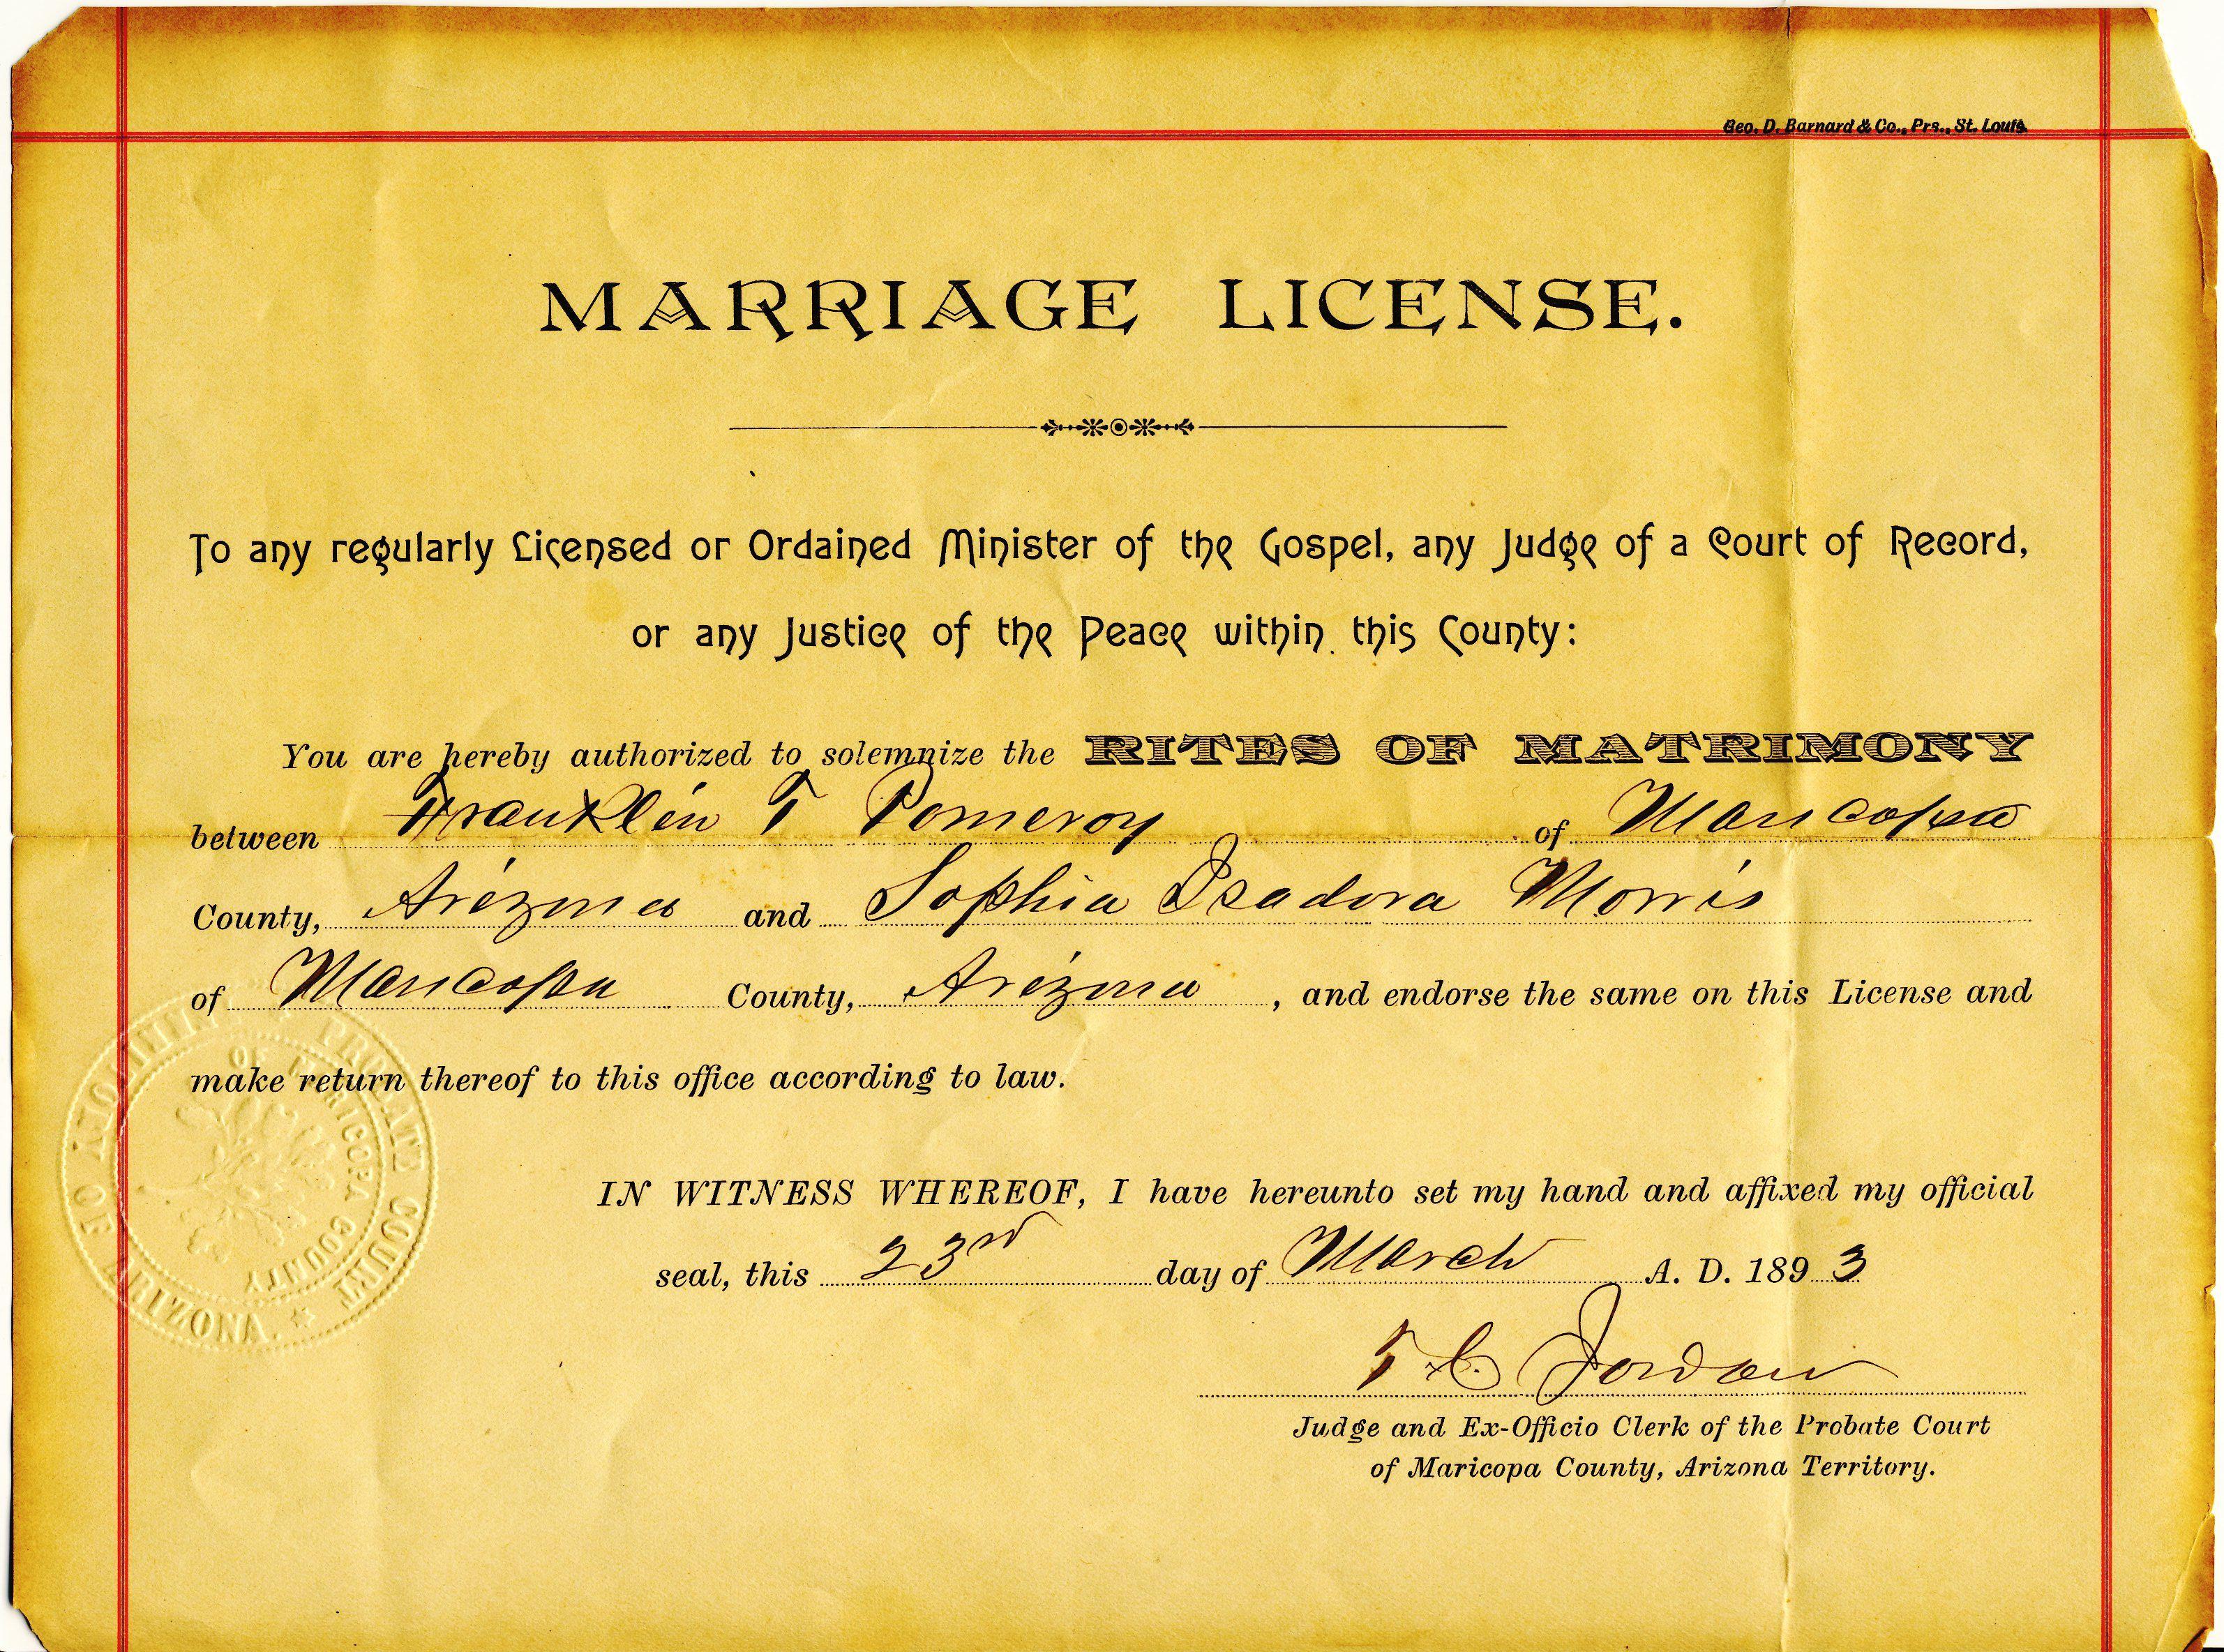 Marriage License 1893 Arizona Territory Marriage